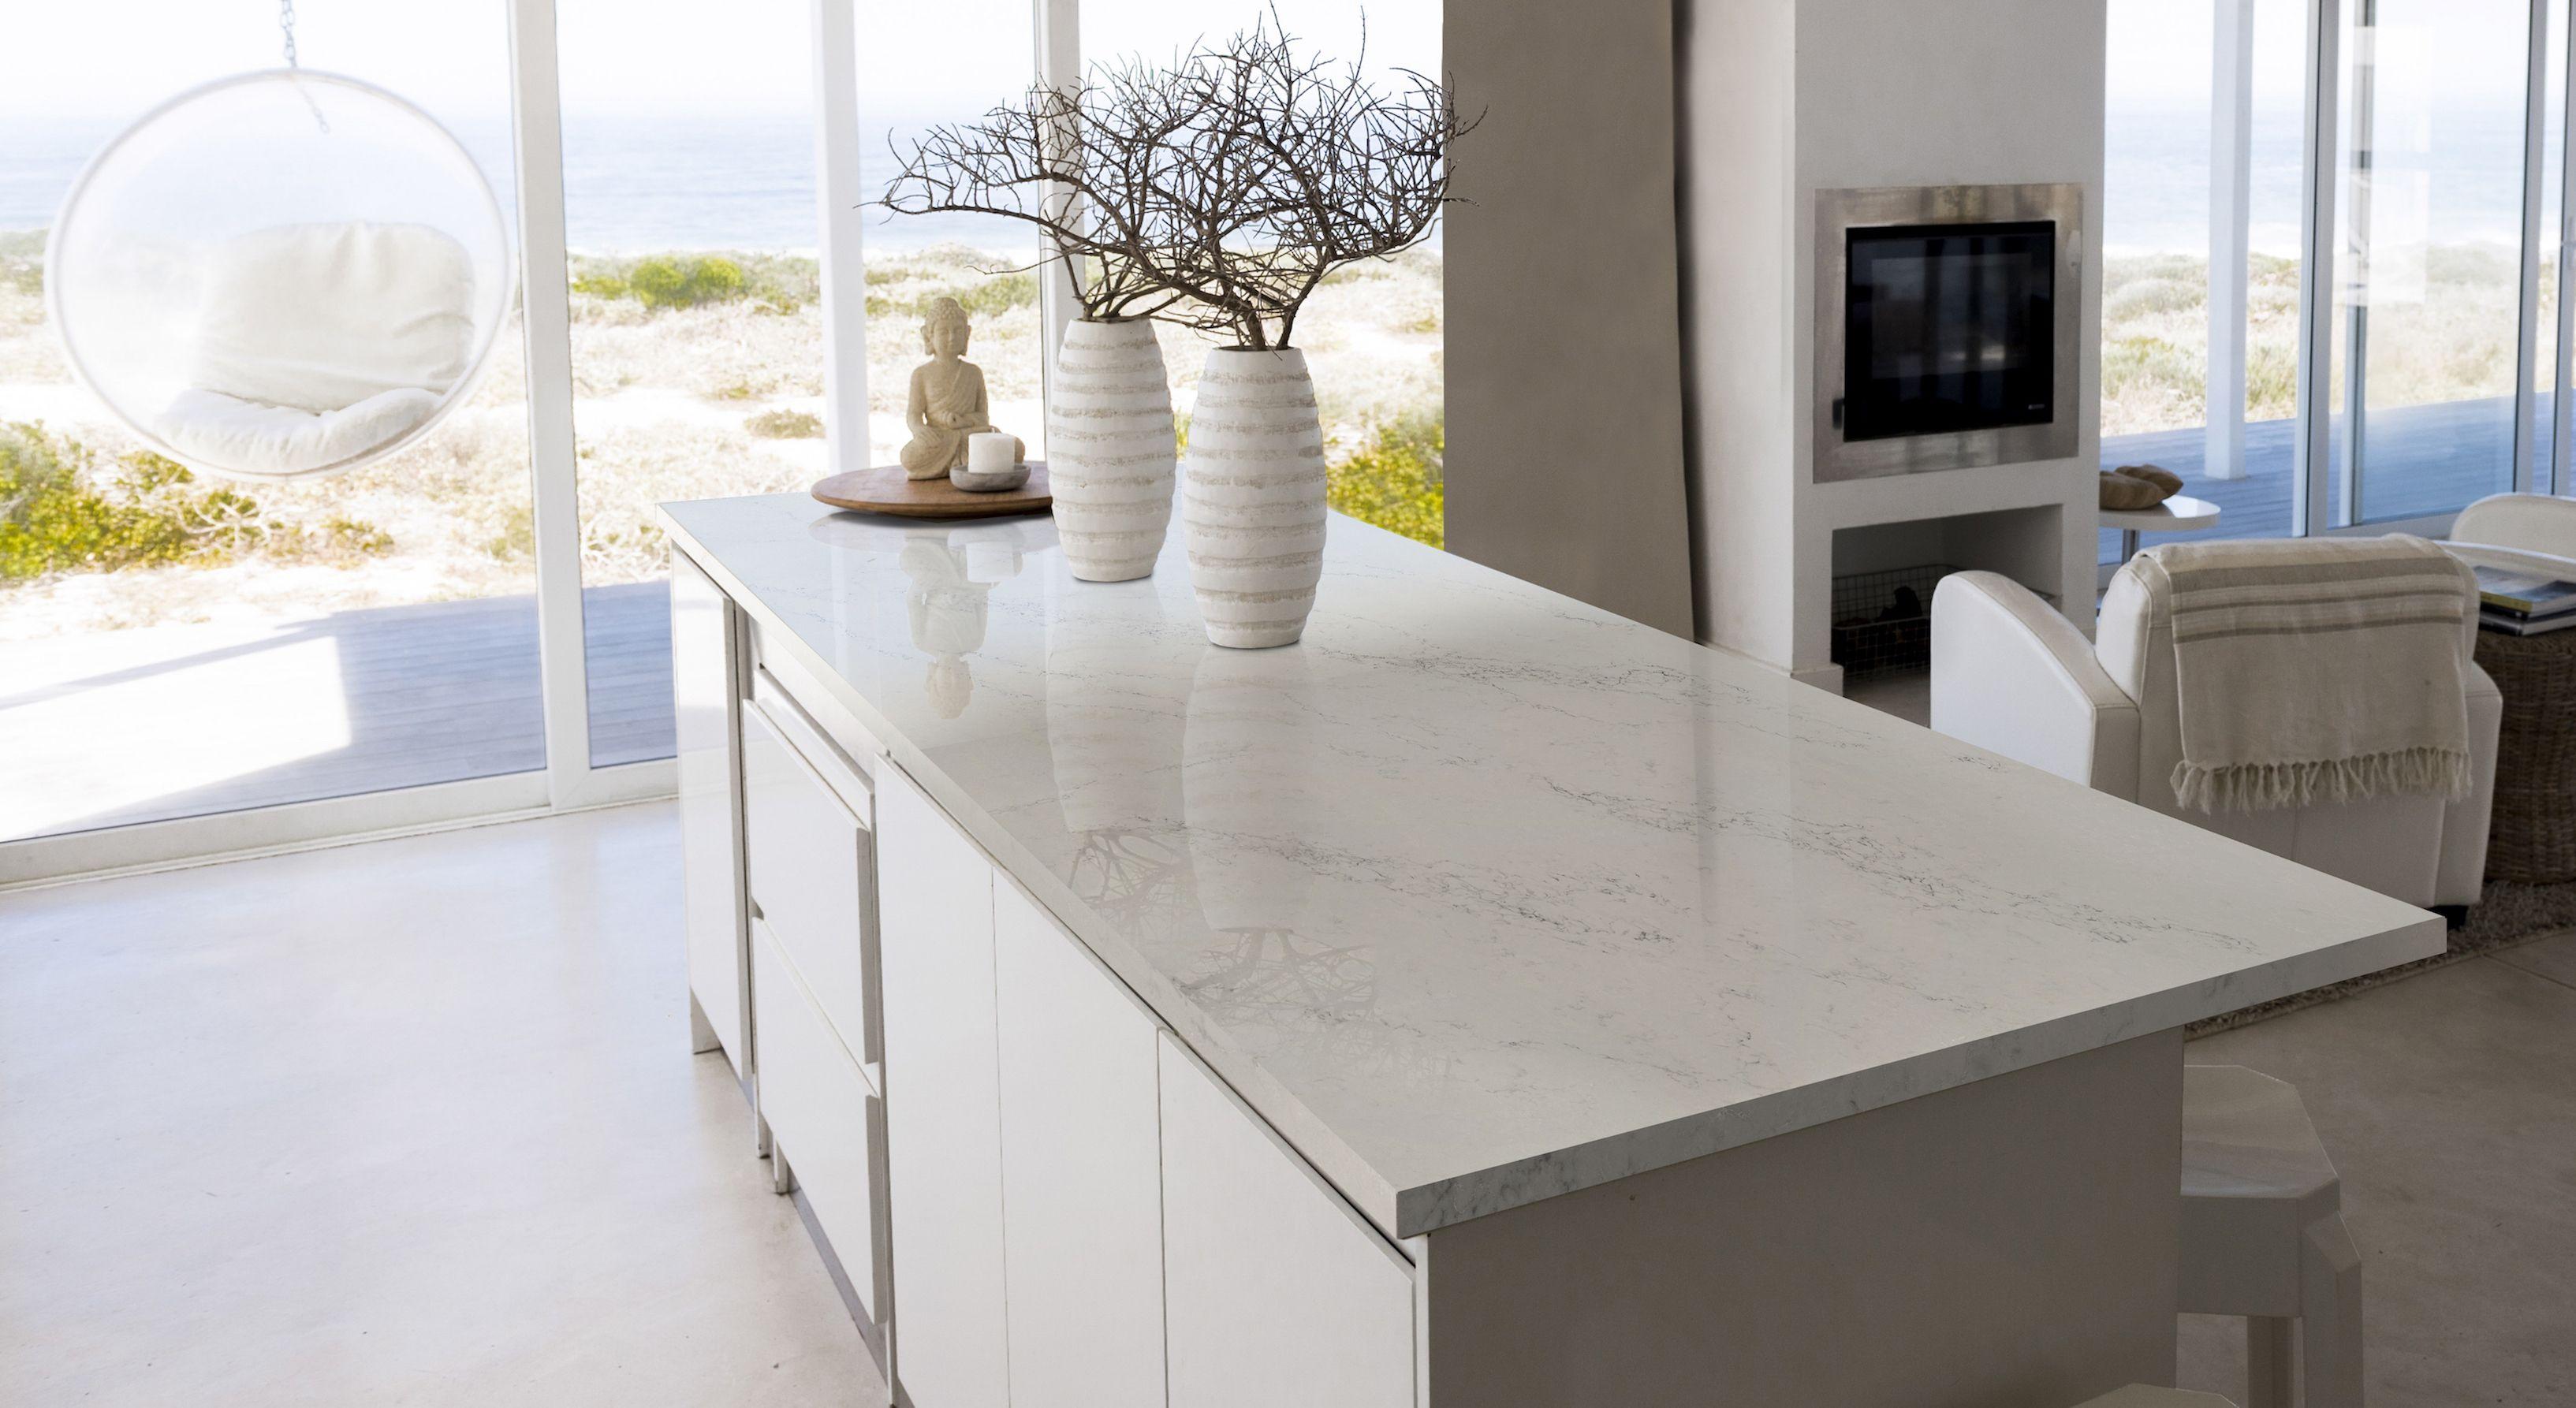 Montauk Cabinets And Countertops Kitchen Renovation Kitchen Design